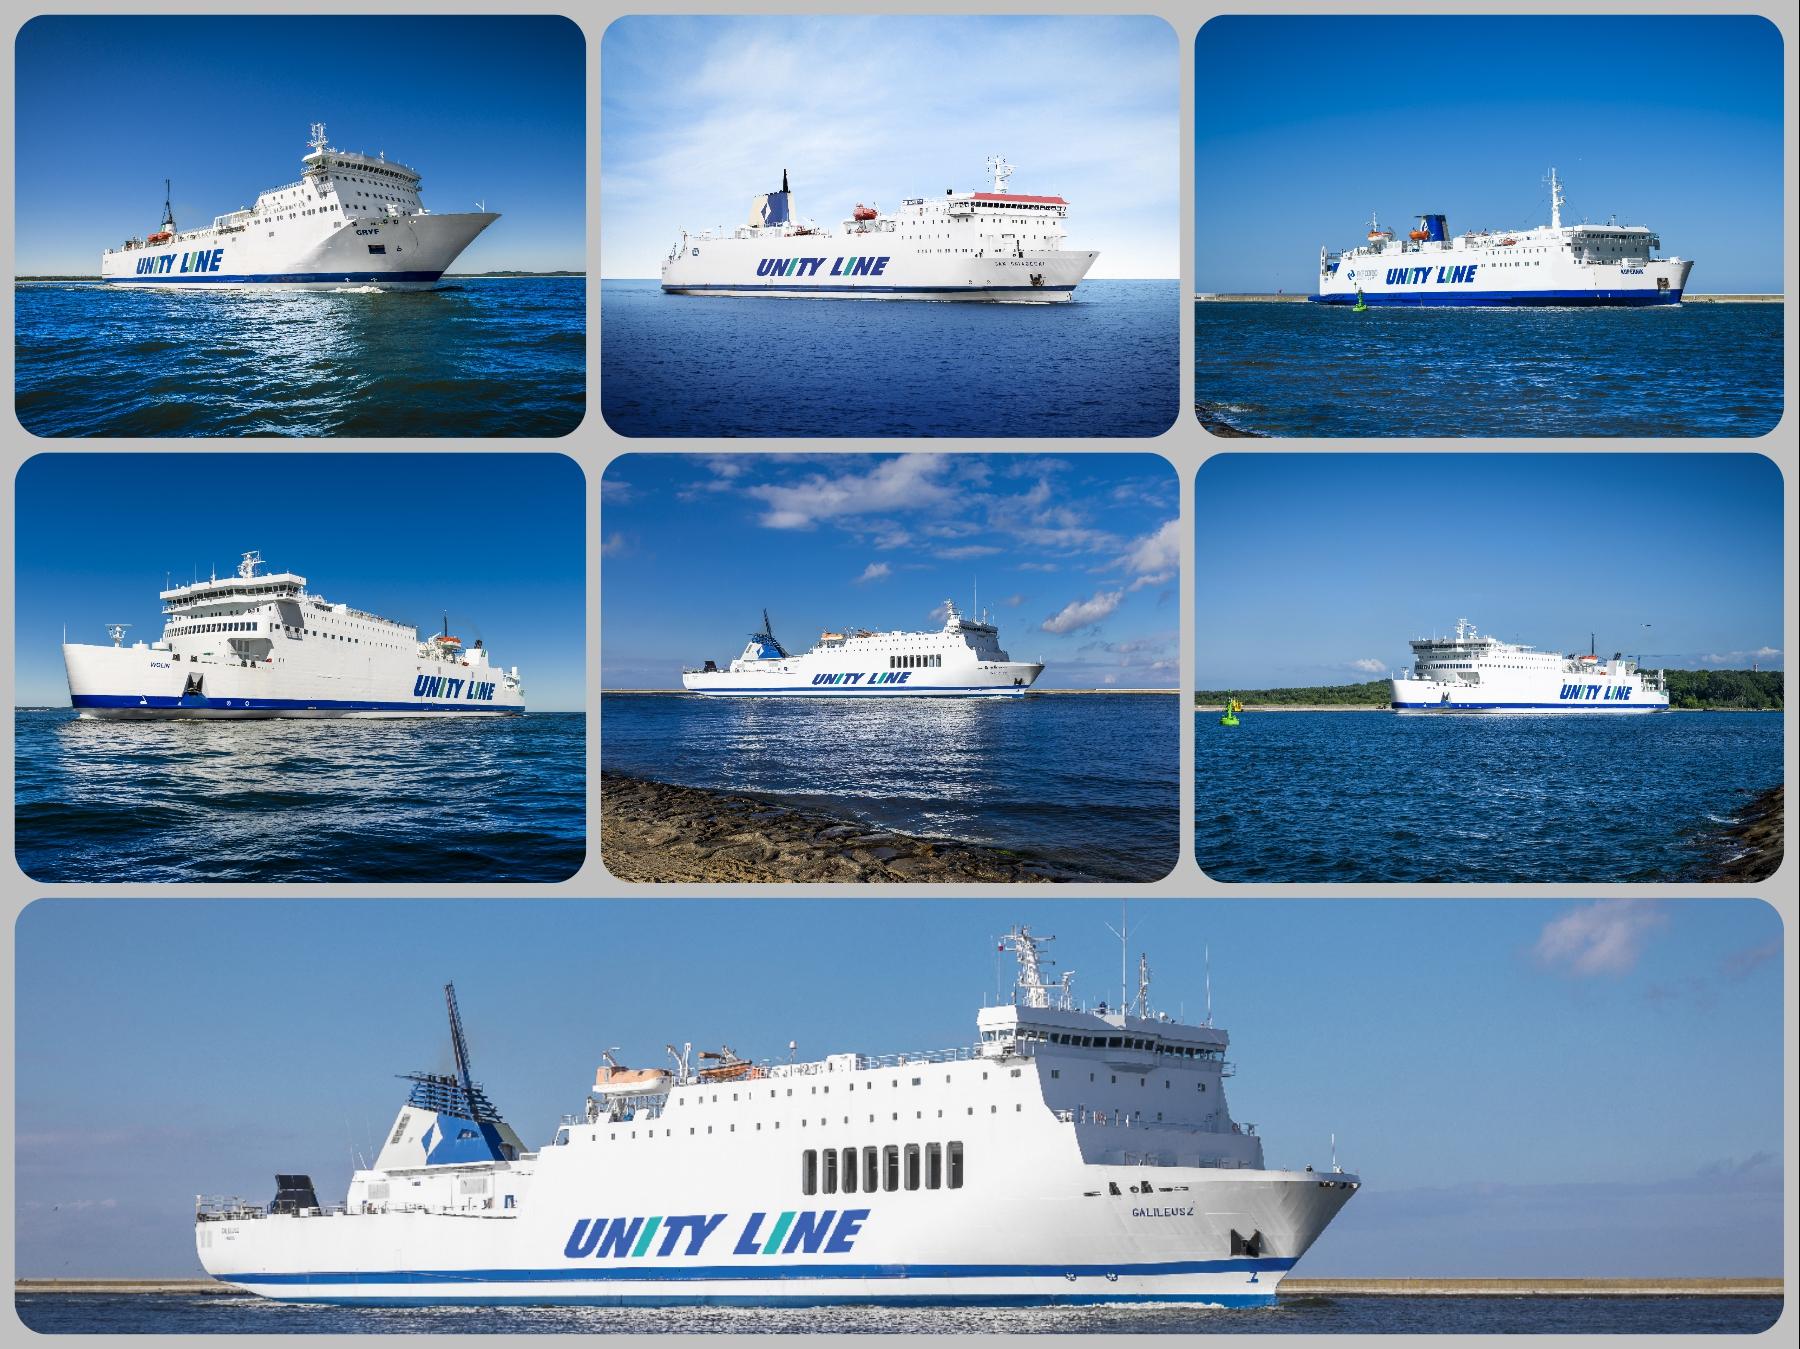 UNITY LINE cargo.promy.pl